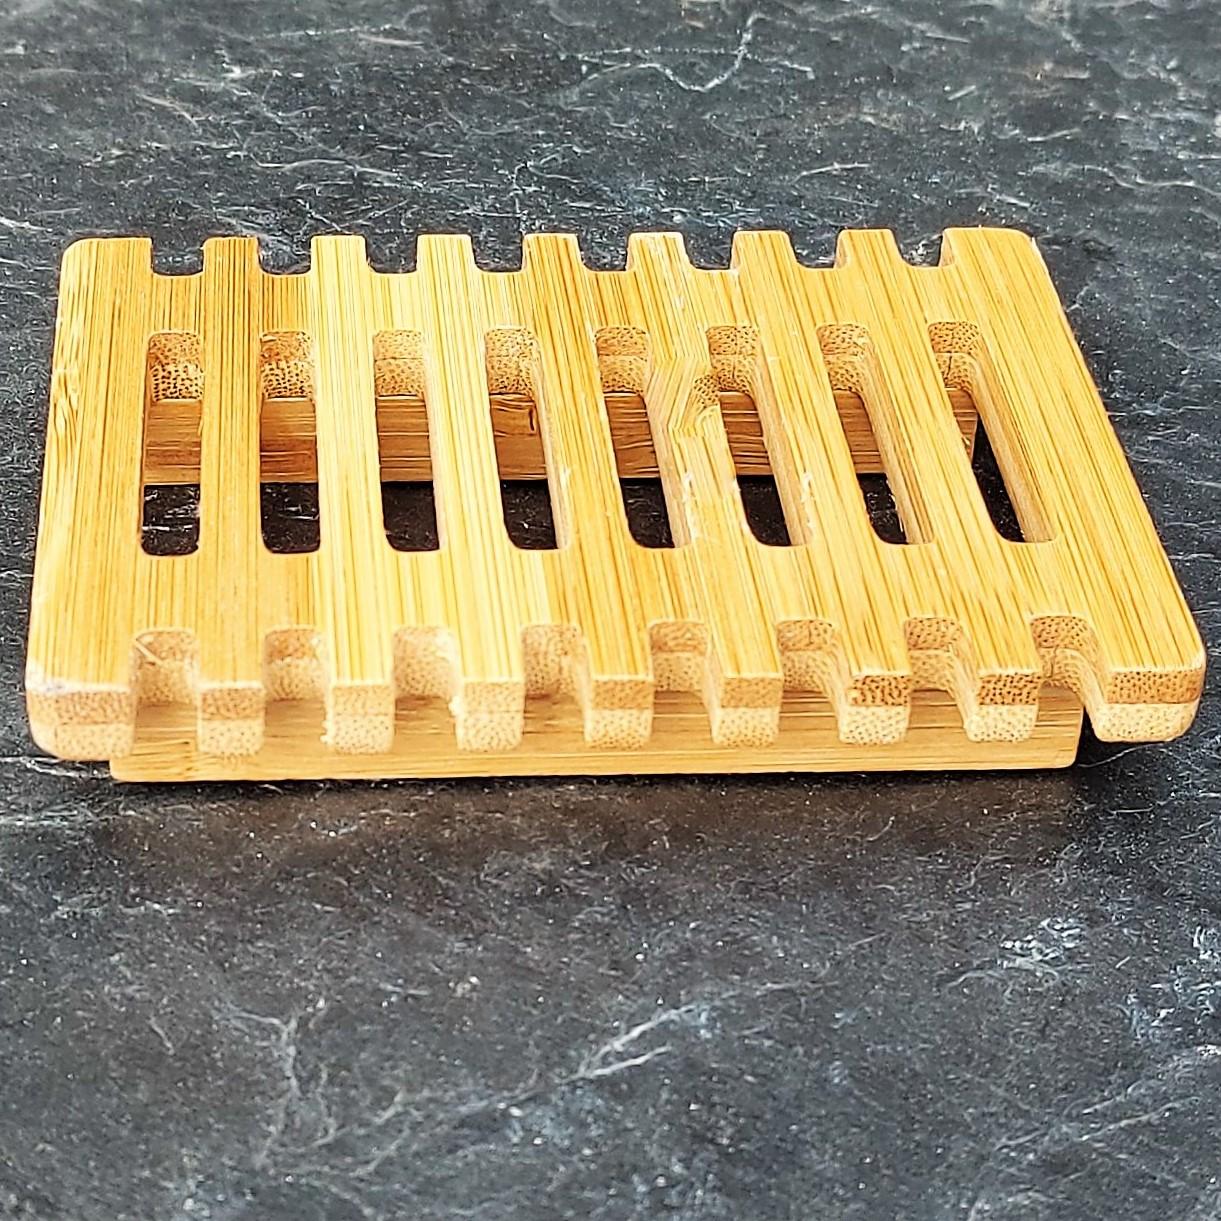 Serrated Soap Rack